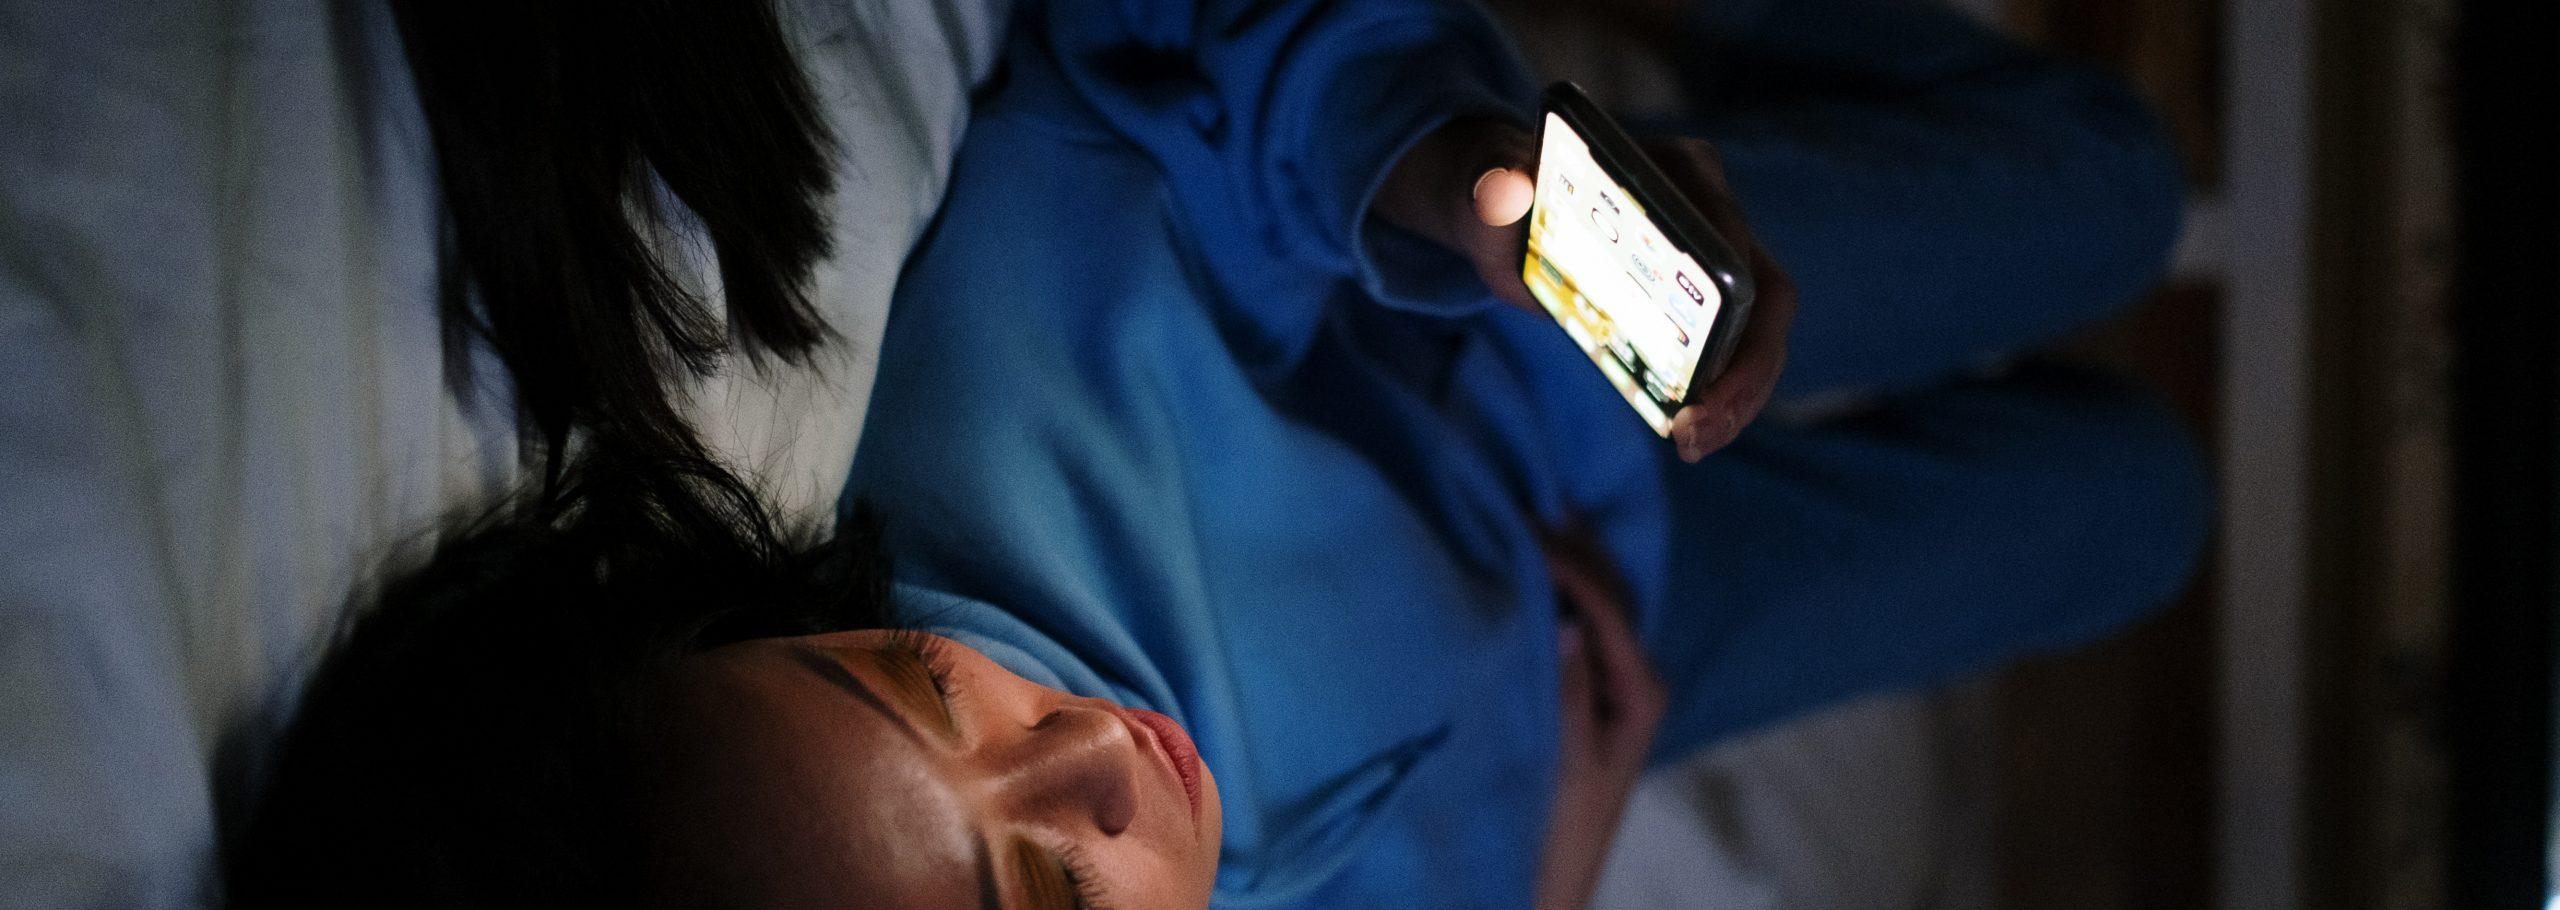 social media effects on sleep quality